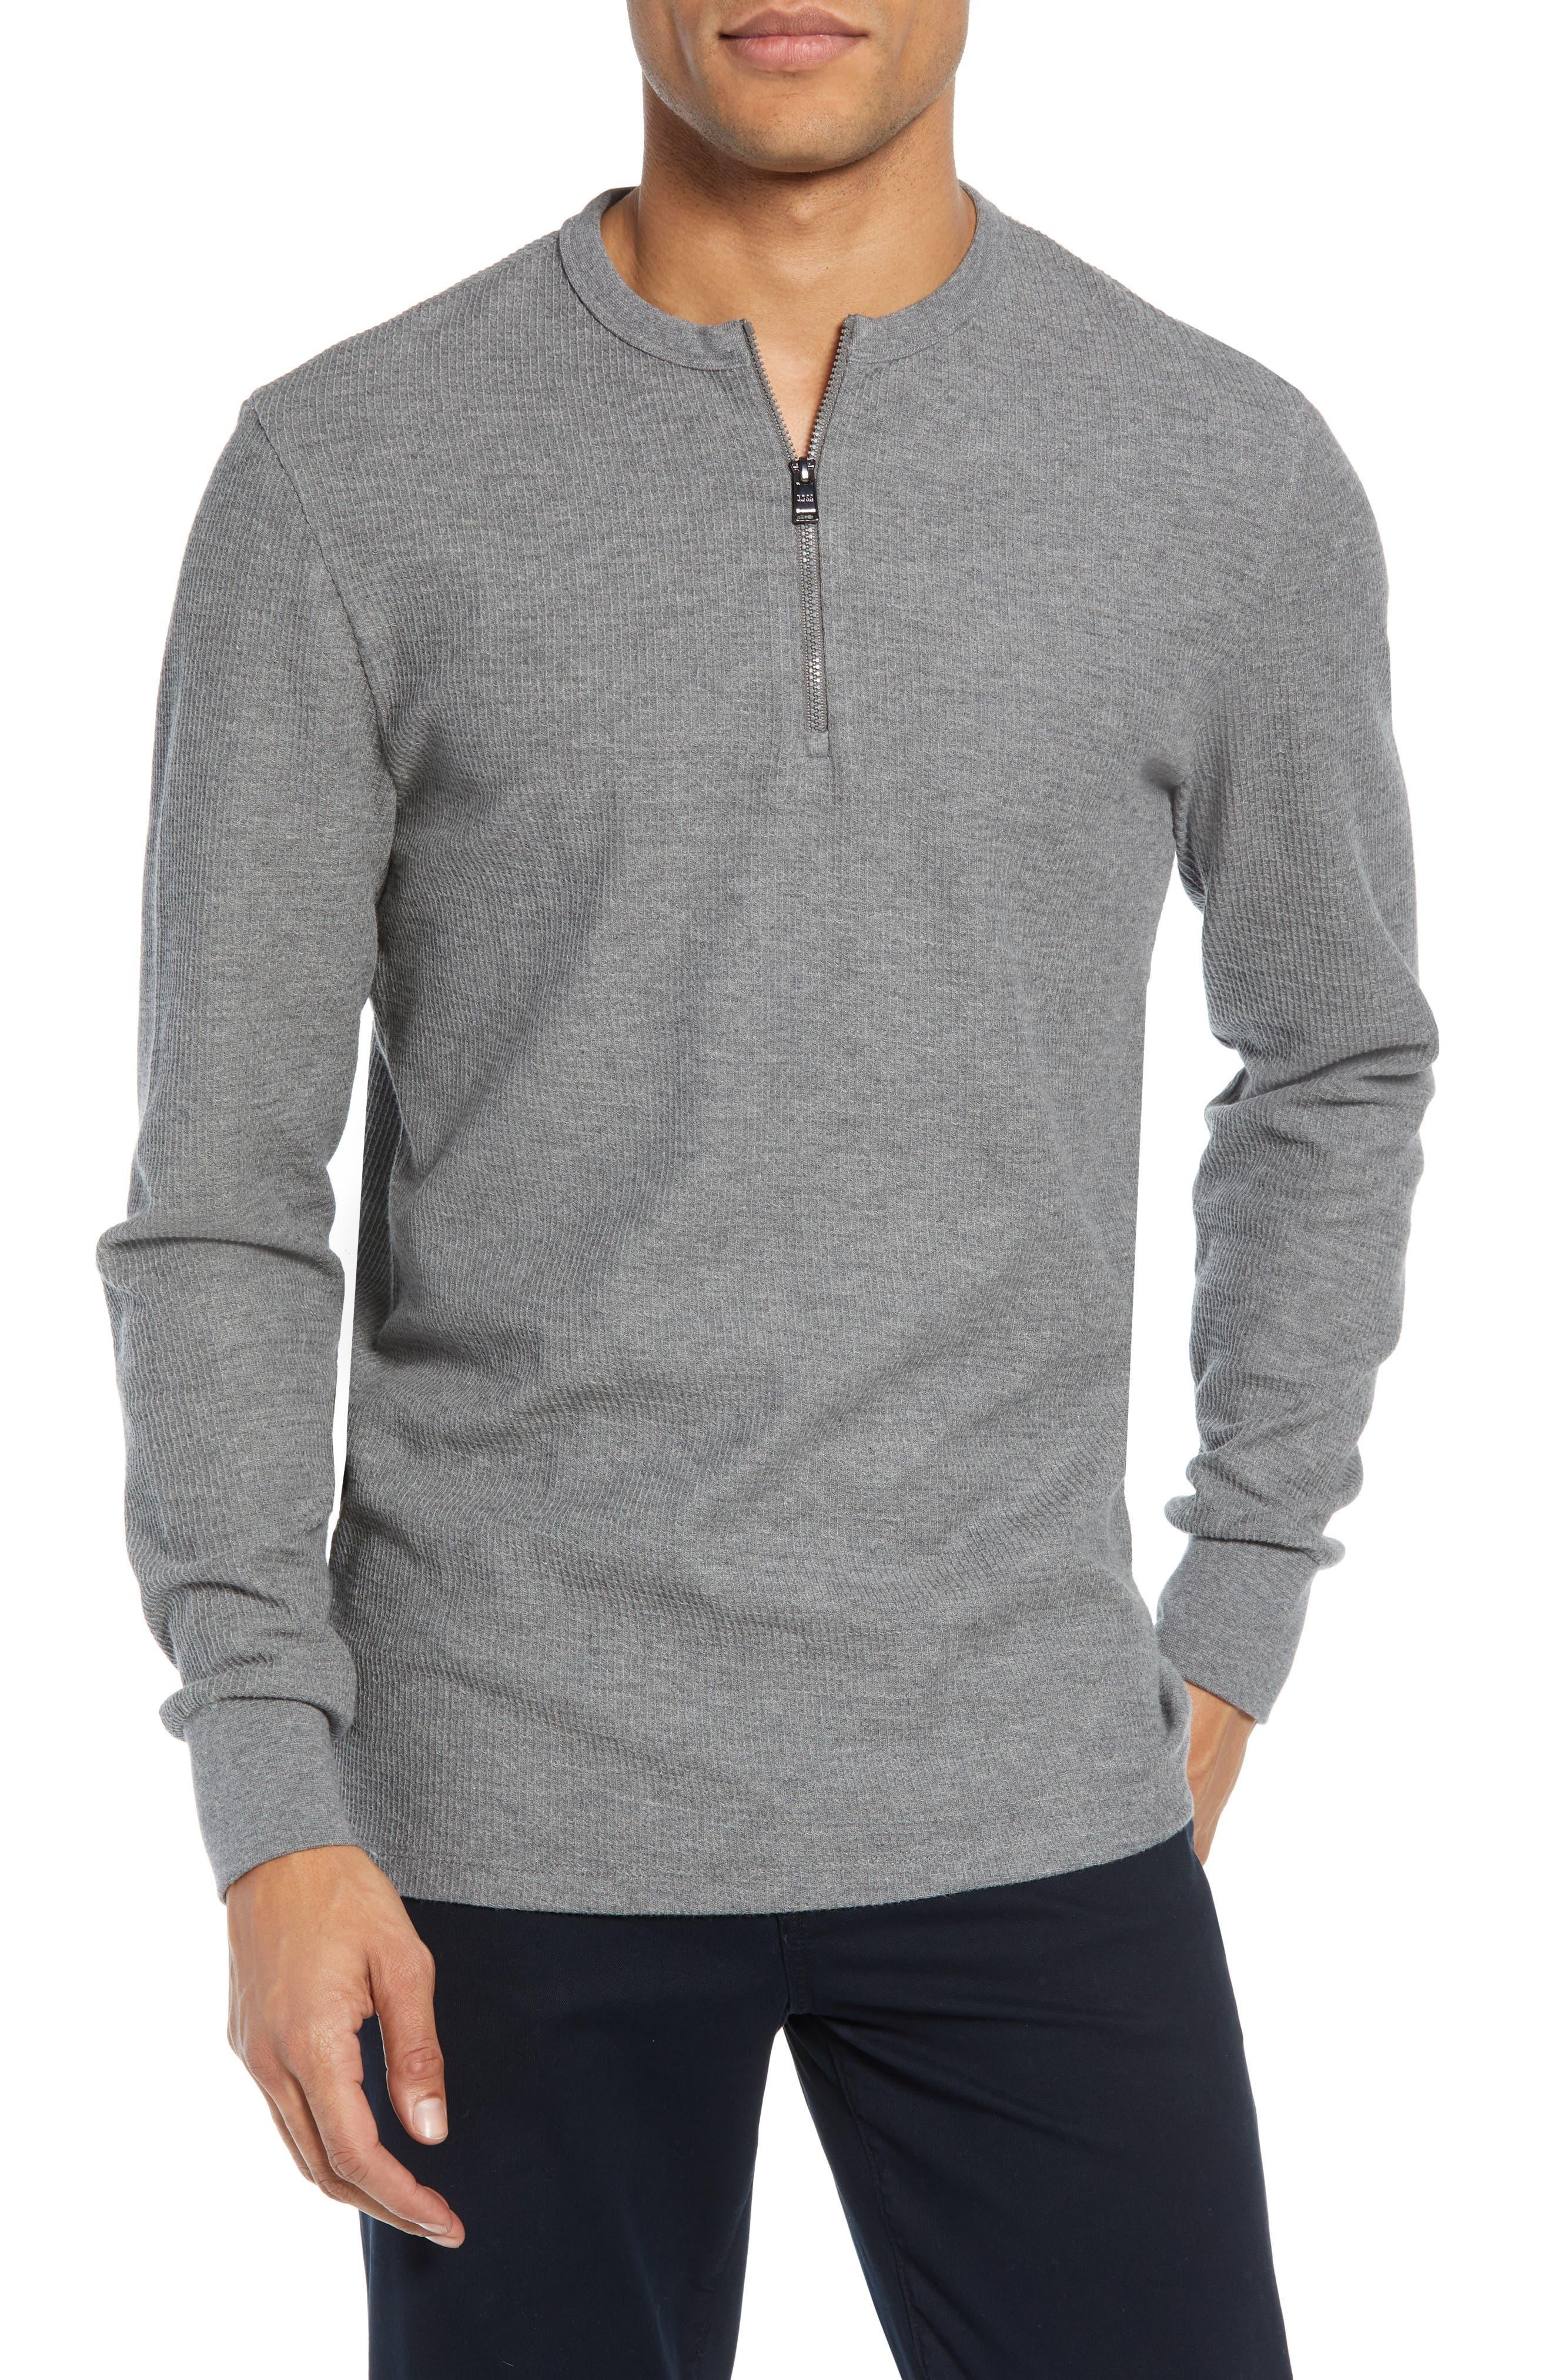 Textor Quarter Zip Thermal T-Shirt,                             Main thumbnail 1, color,                             GREY